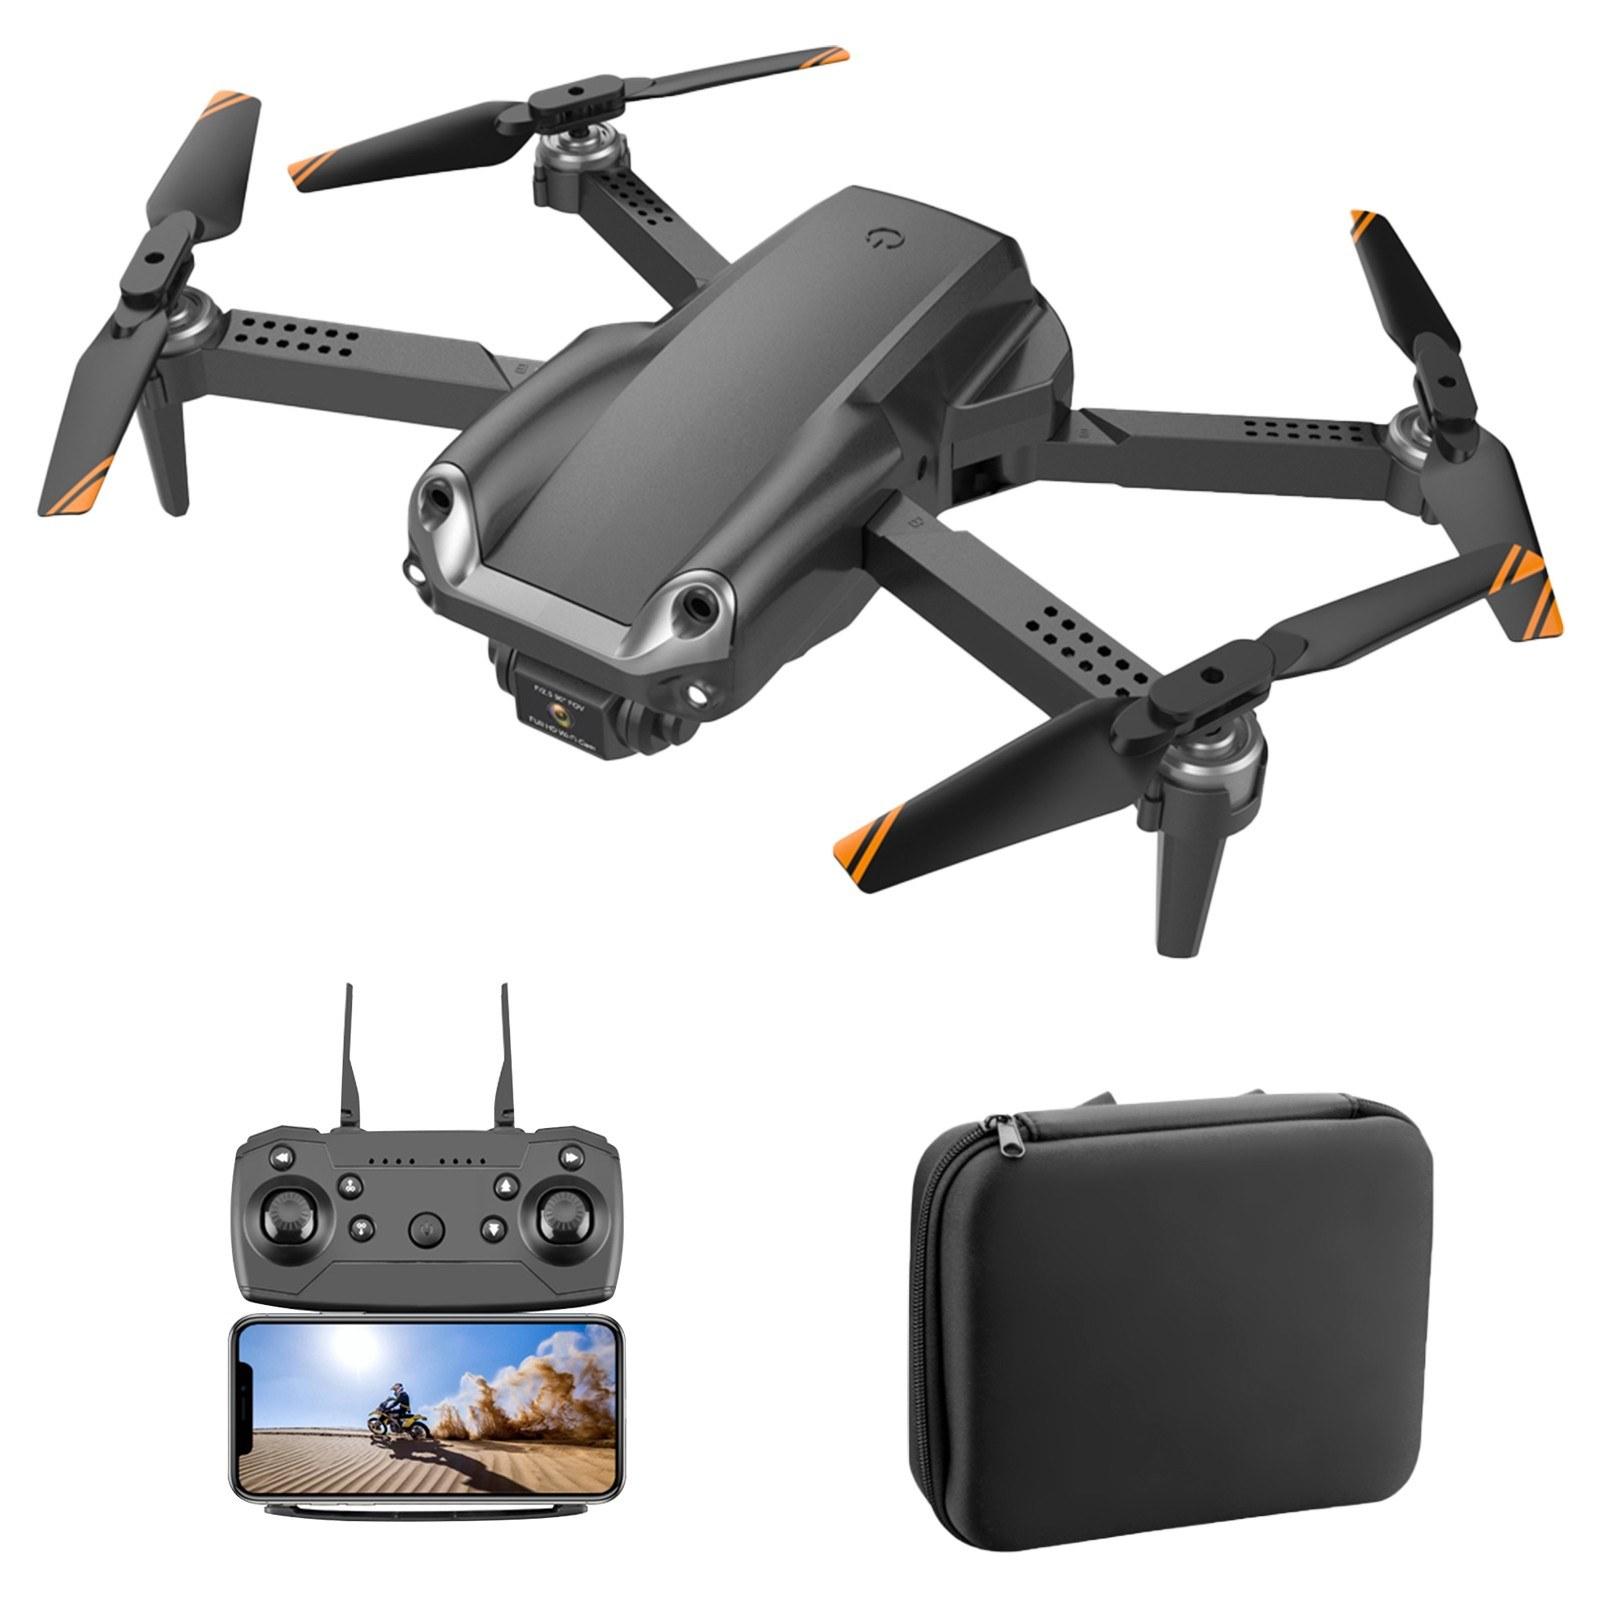 Tomtop - [EU Warehouse] 51% OFF 4K Camera RC Quadcopter RC Drone, $34.99 (Inclusive of VAT)